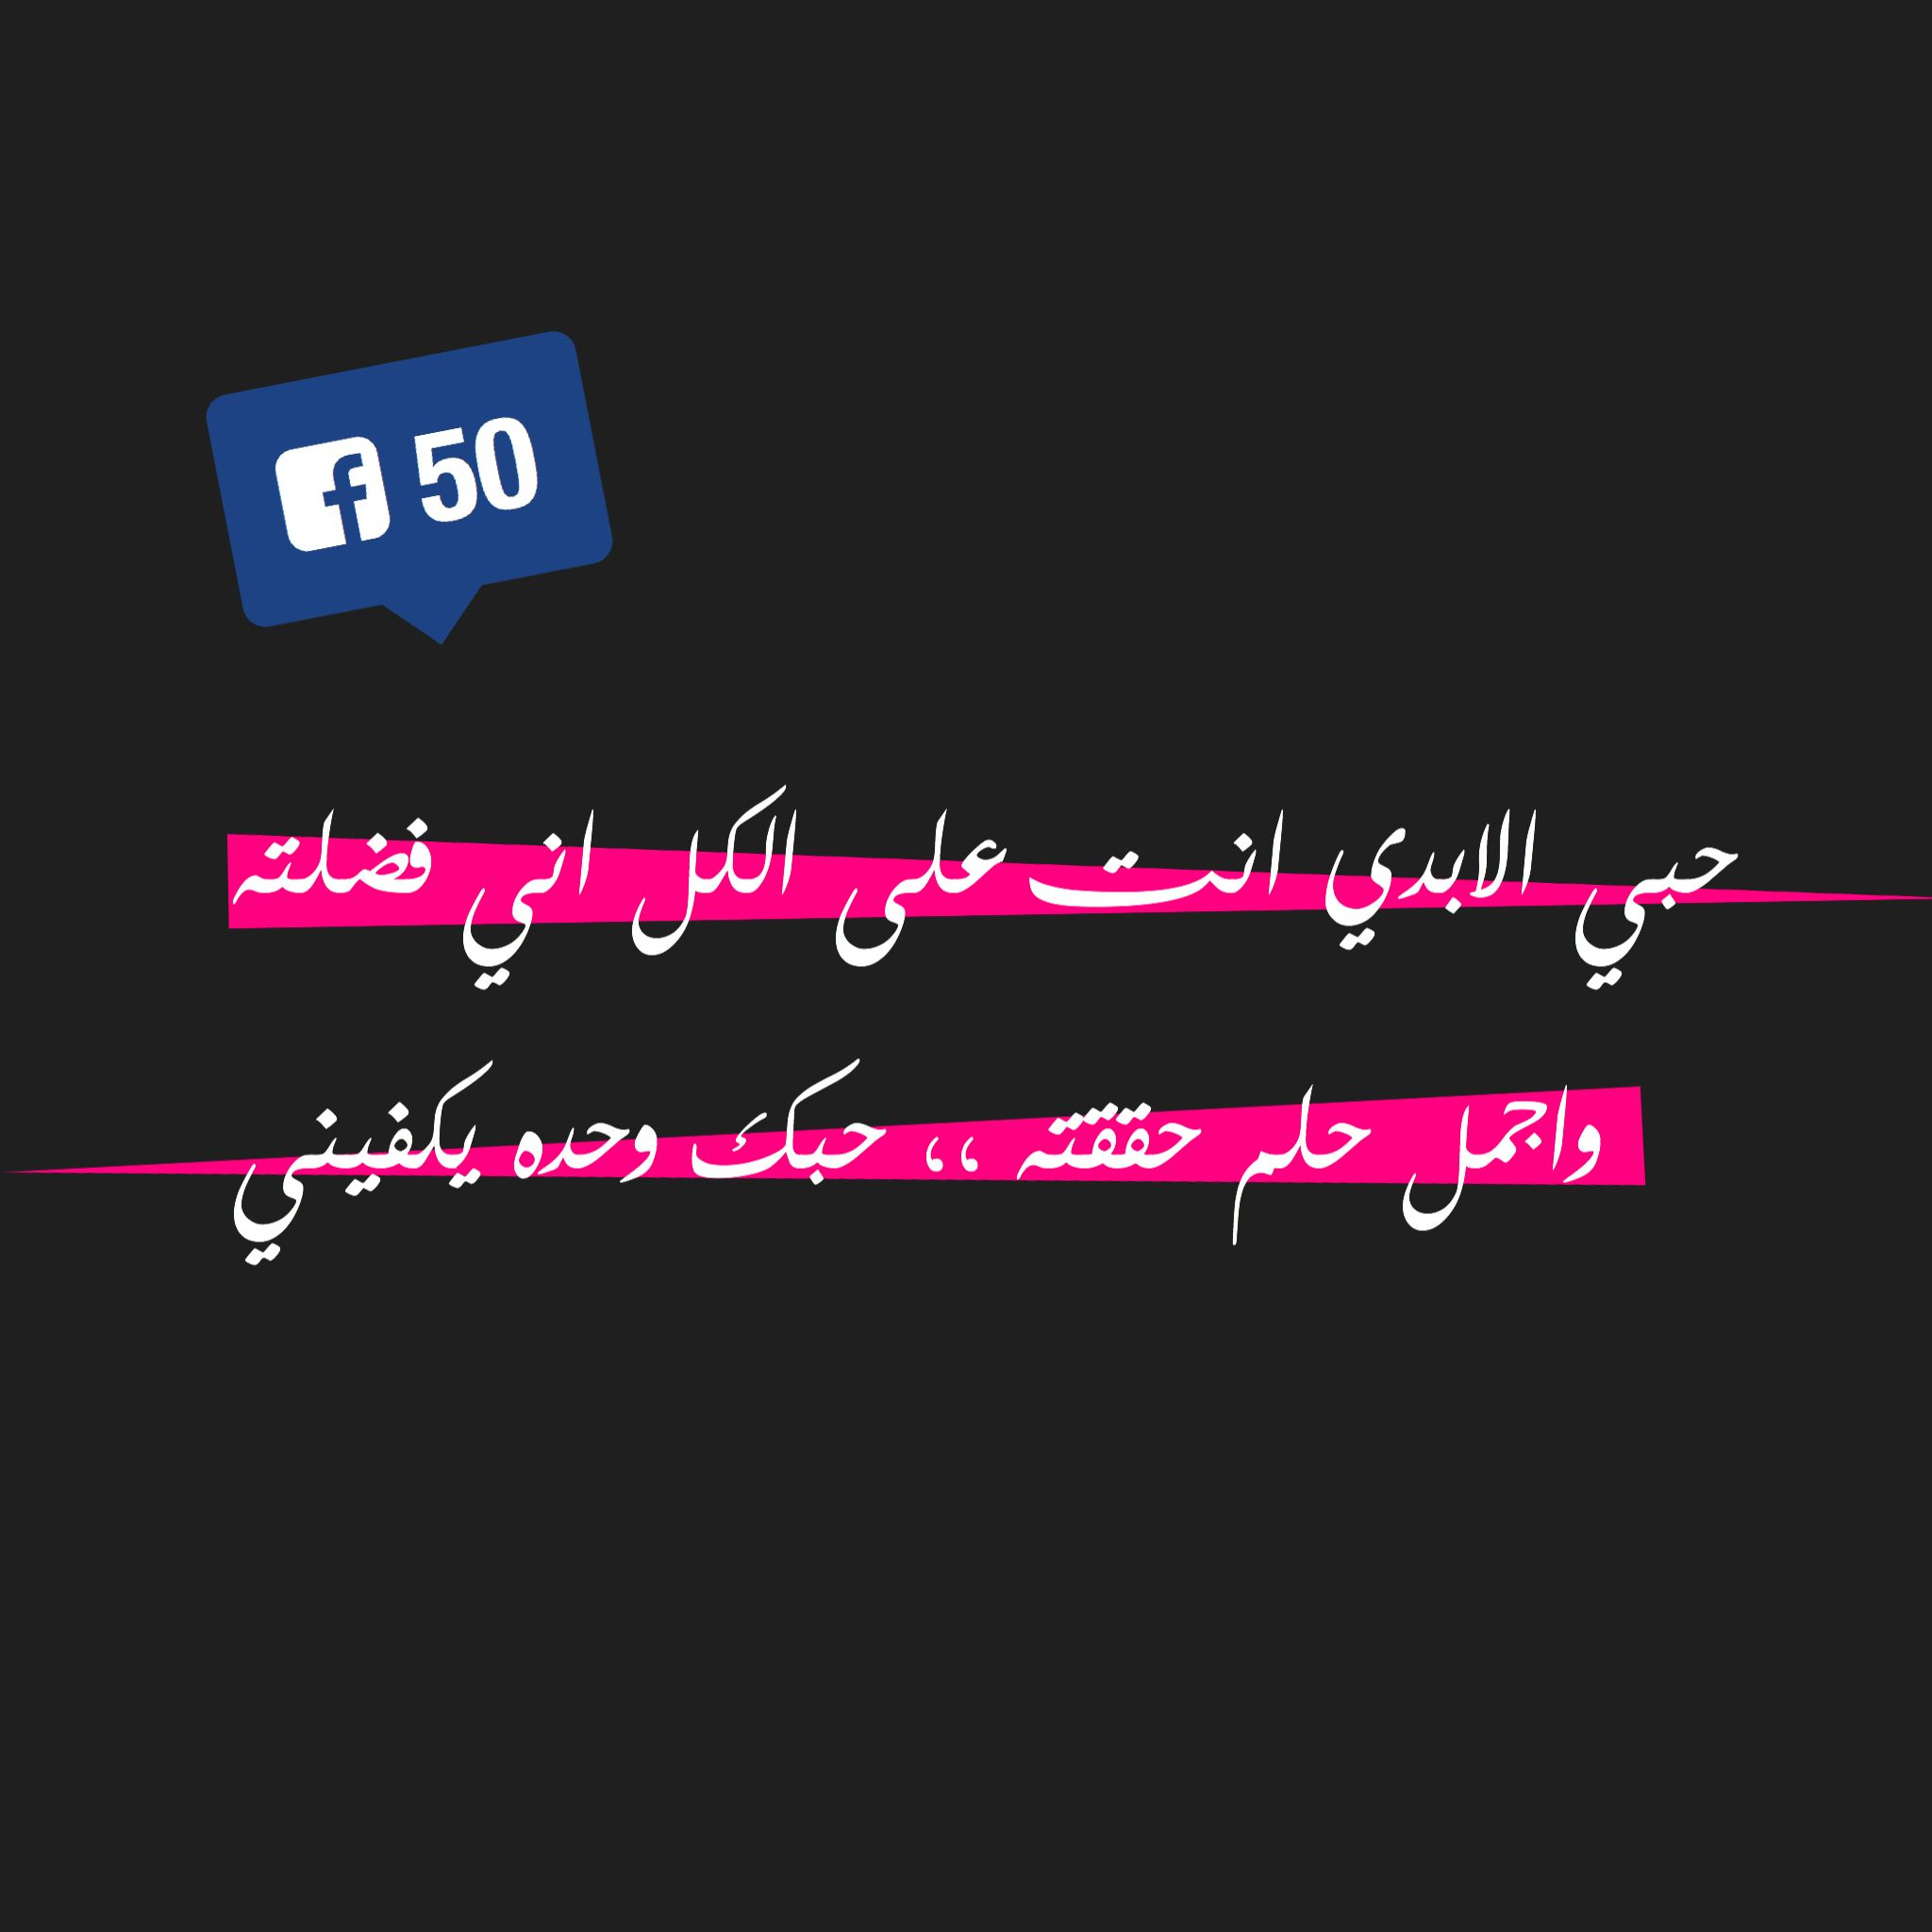 Pin By گرزآيهہ On رمزيات Soulmate Arabic Calligraphy Calligraphy